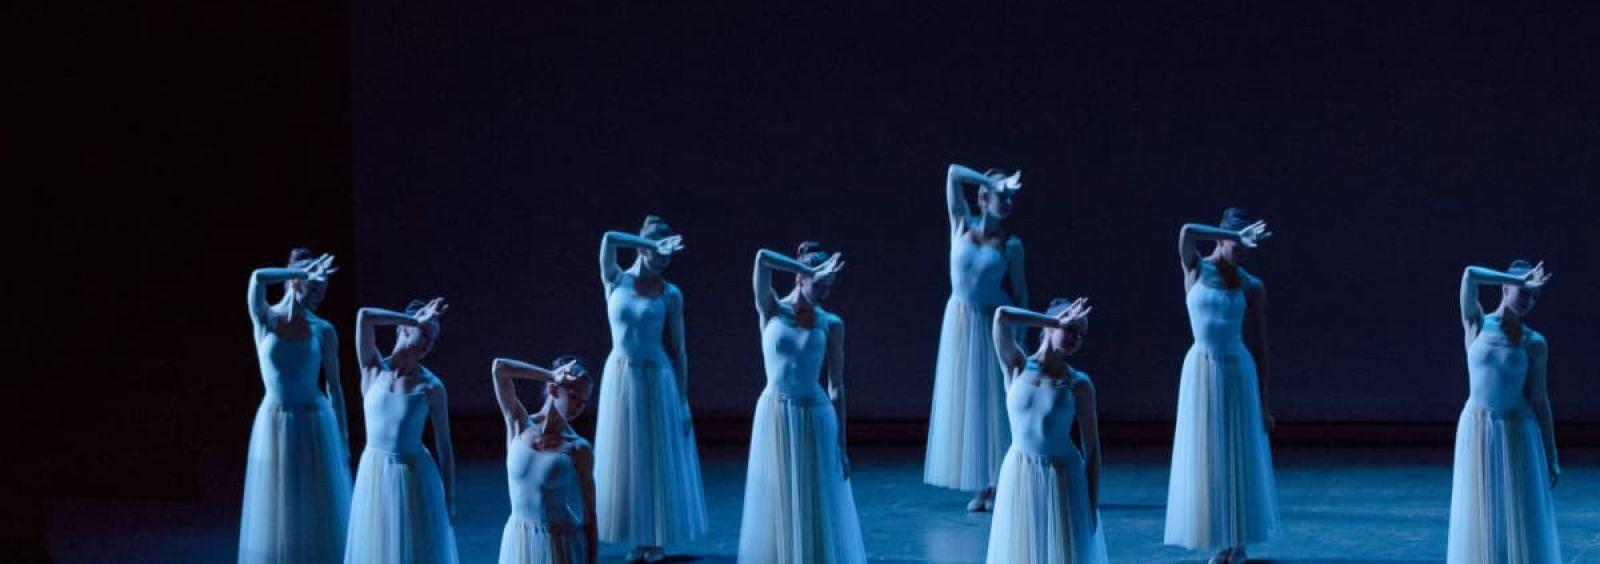 new york city ballet dancers on stage